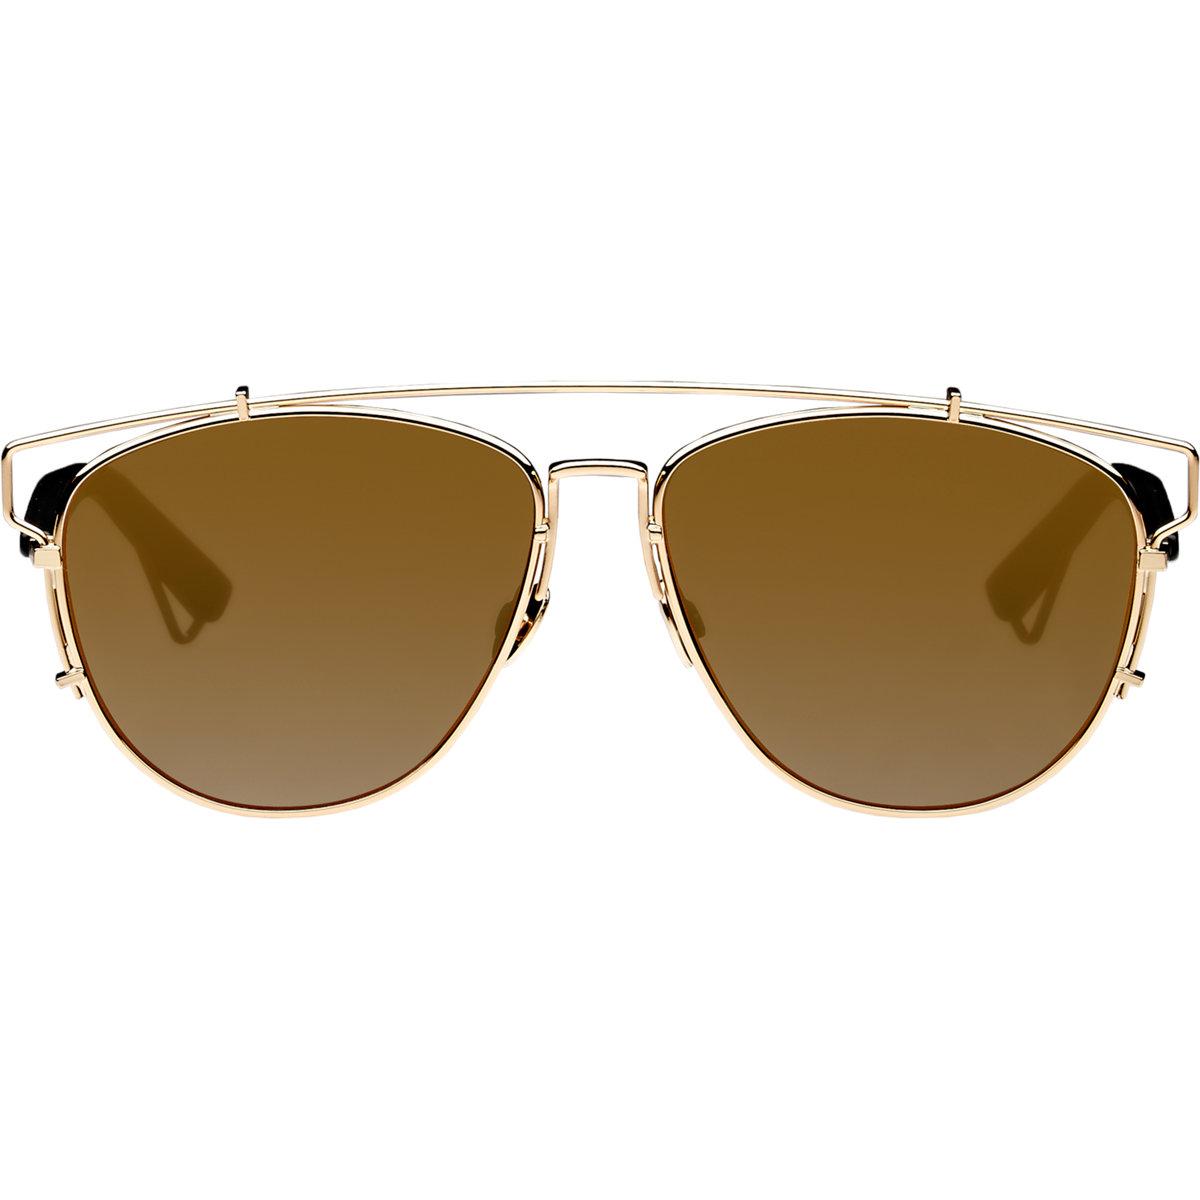 Dior Gold Frame Sunglasses : Dior Technologic Sunglasses in Metallic Lyst